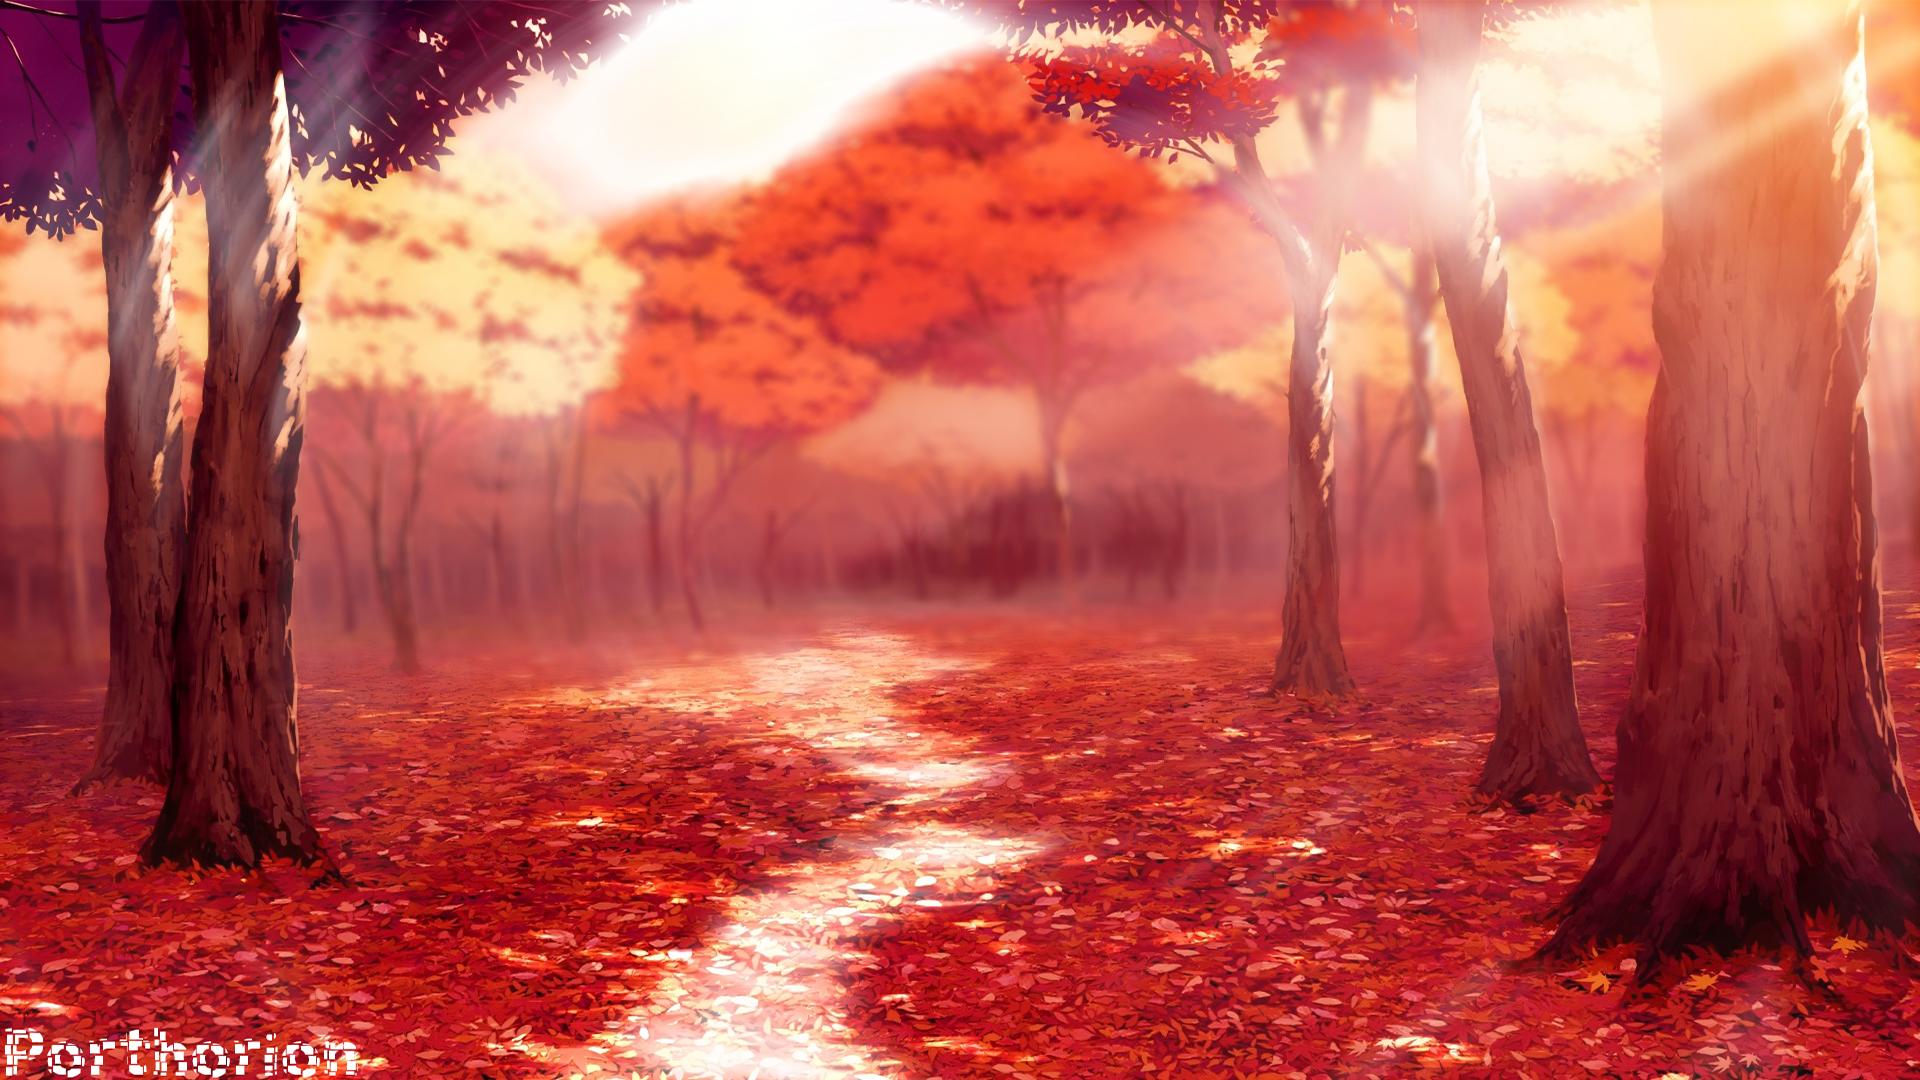 Fall Autemn Season Anime Style